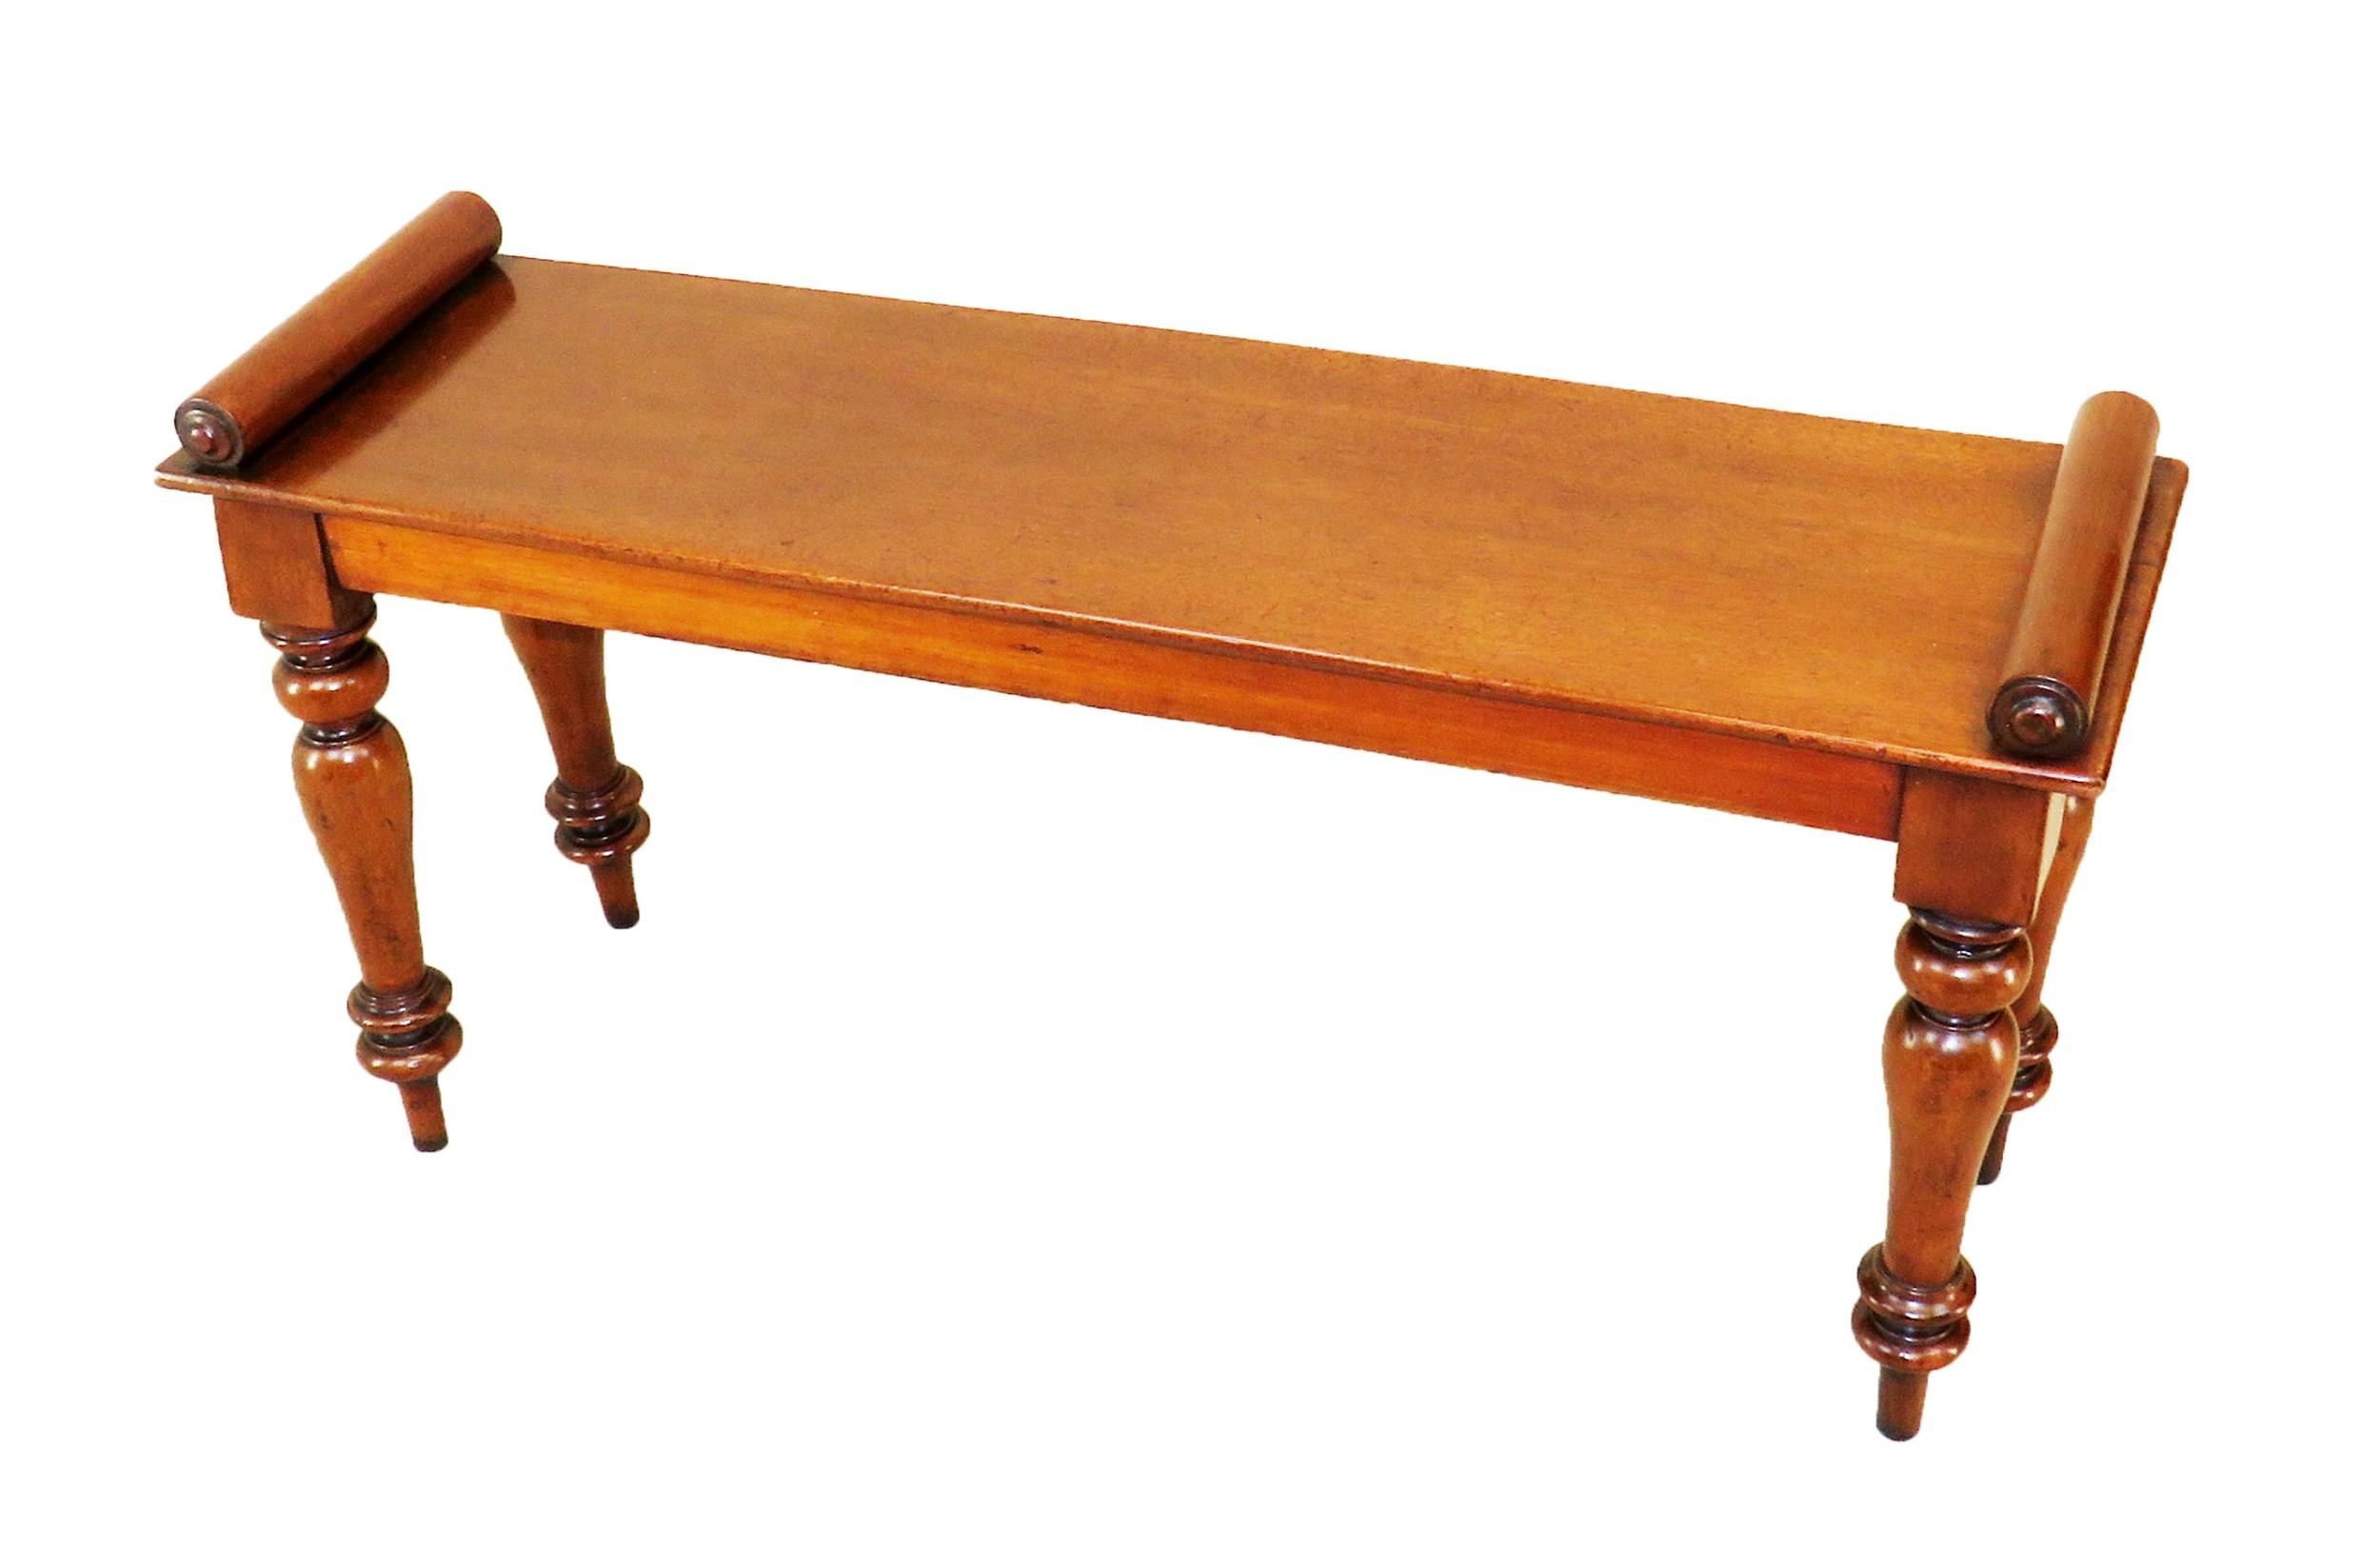 19th century mahogany window seat hall bench